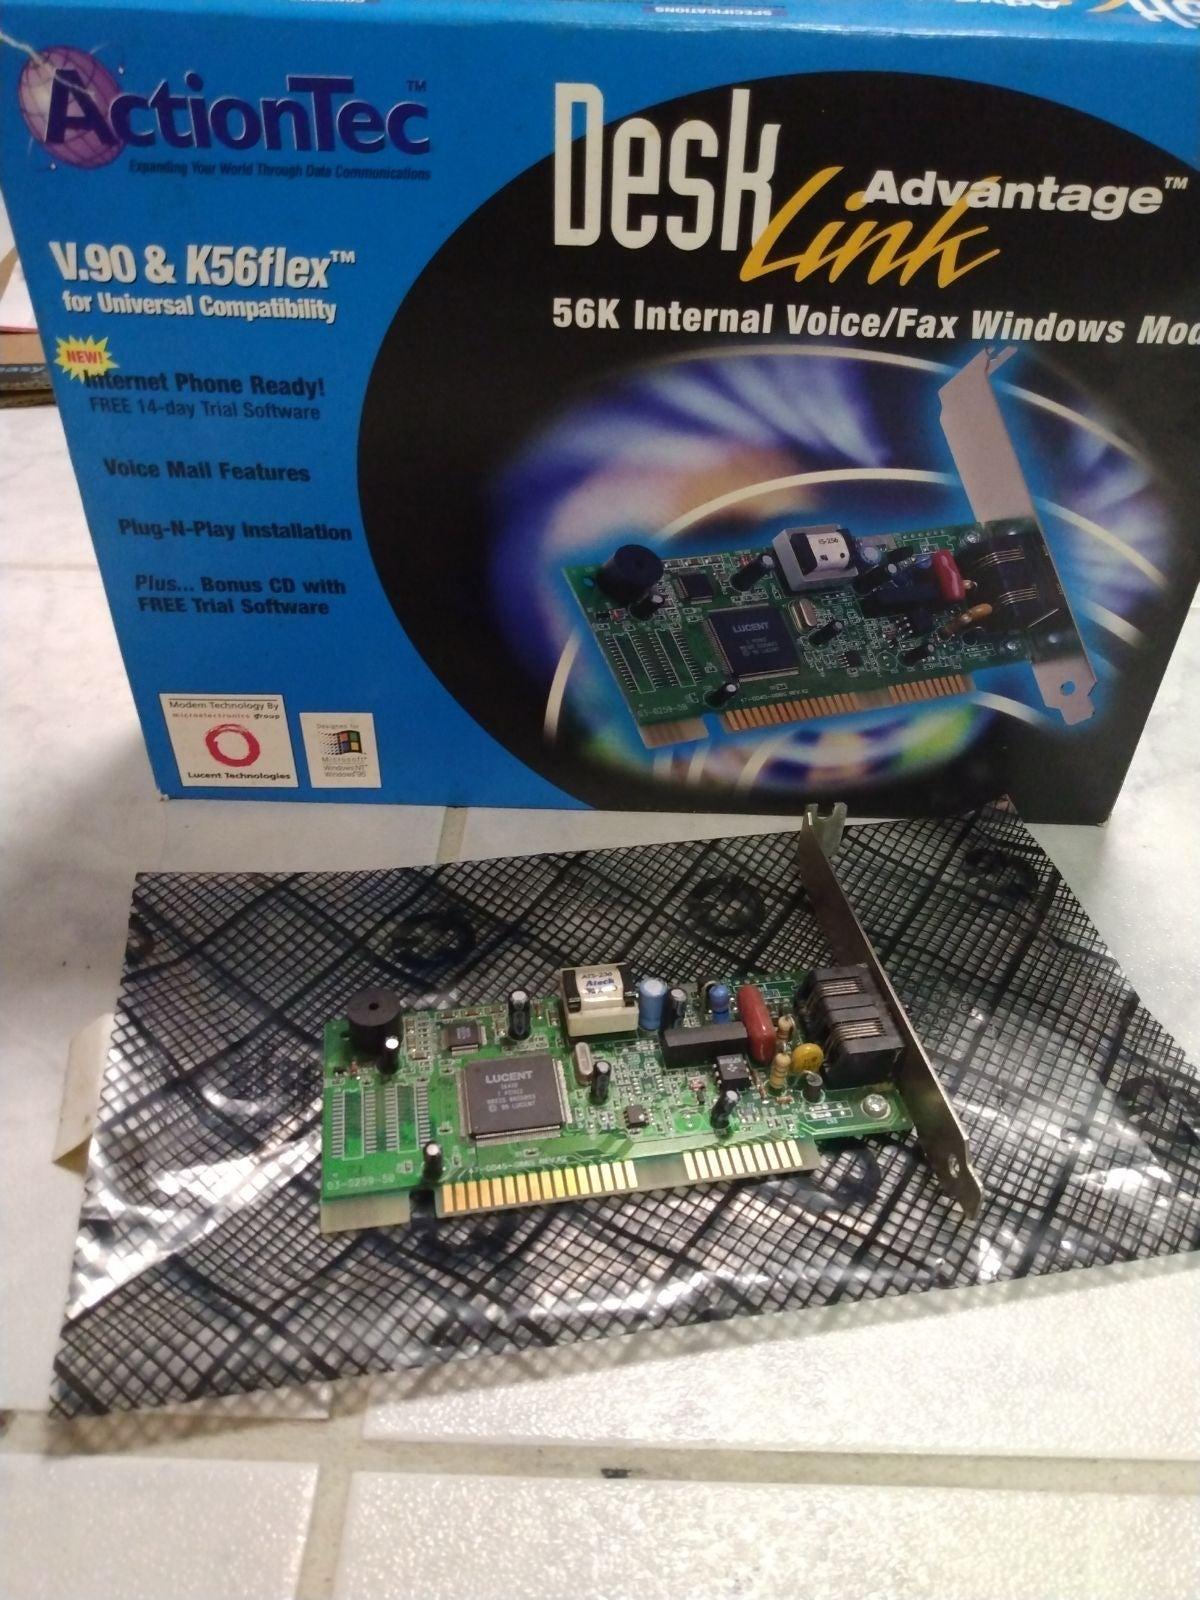 Actiontec 56K V.90 Internal Modem